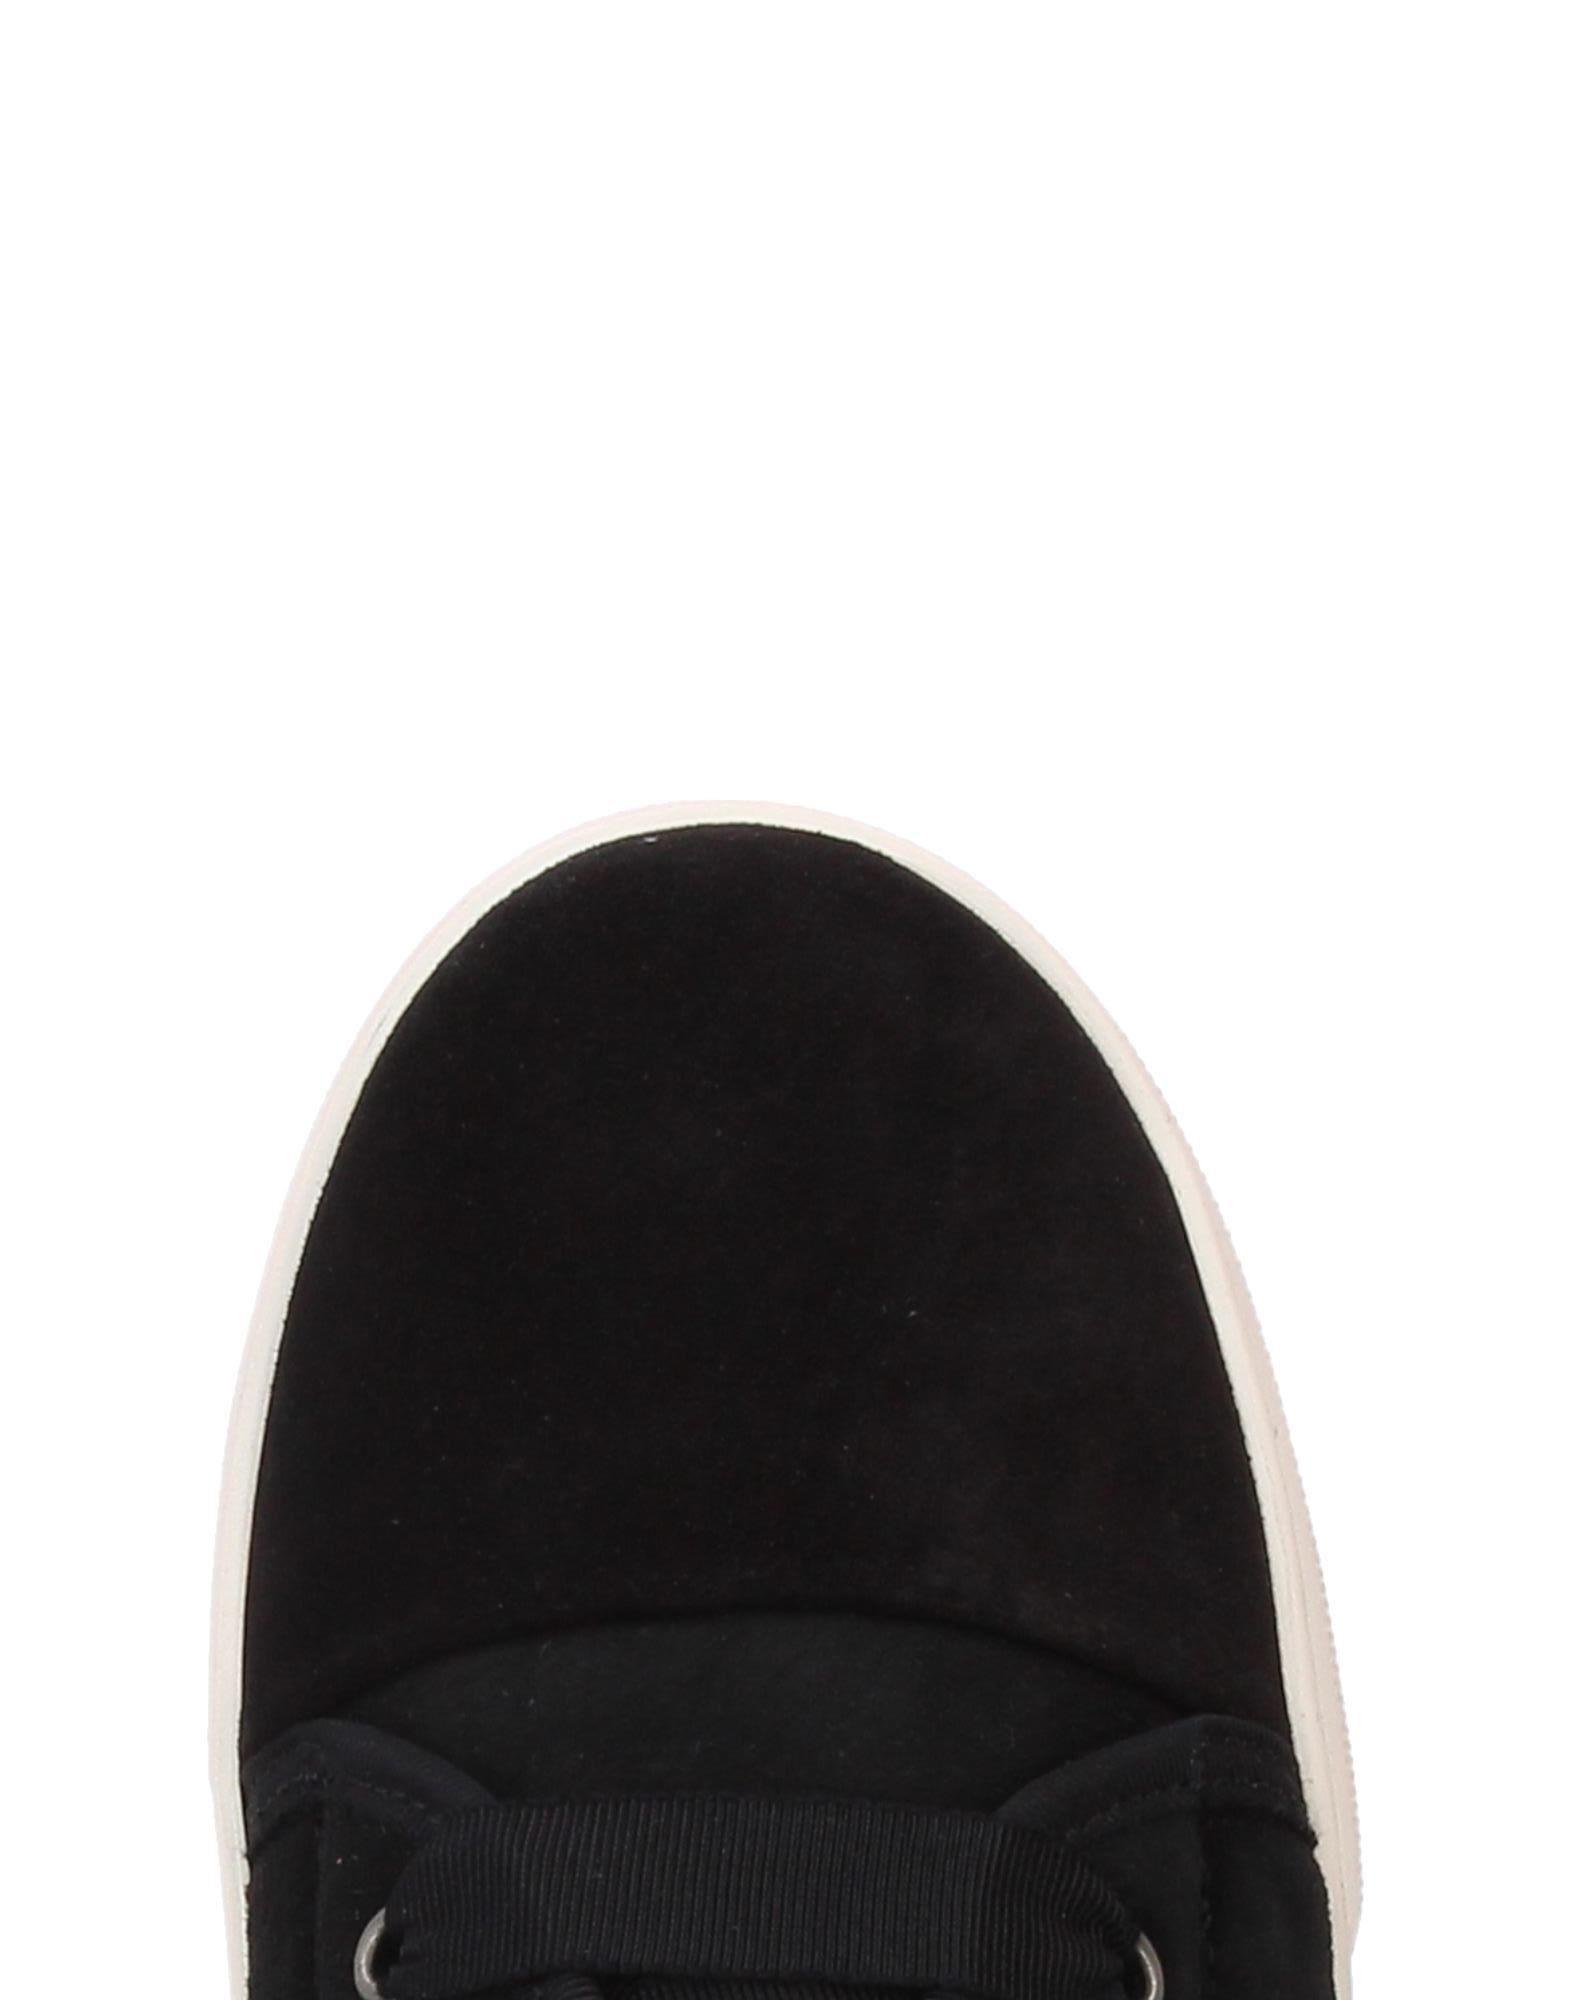 Lanvin  Sneakers Damen  Lanvin 11321689QQGut aussehende strapazierfähige Schuhe 4a26a3